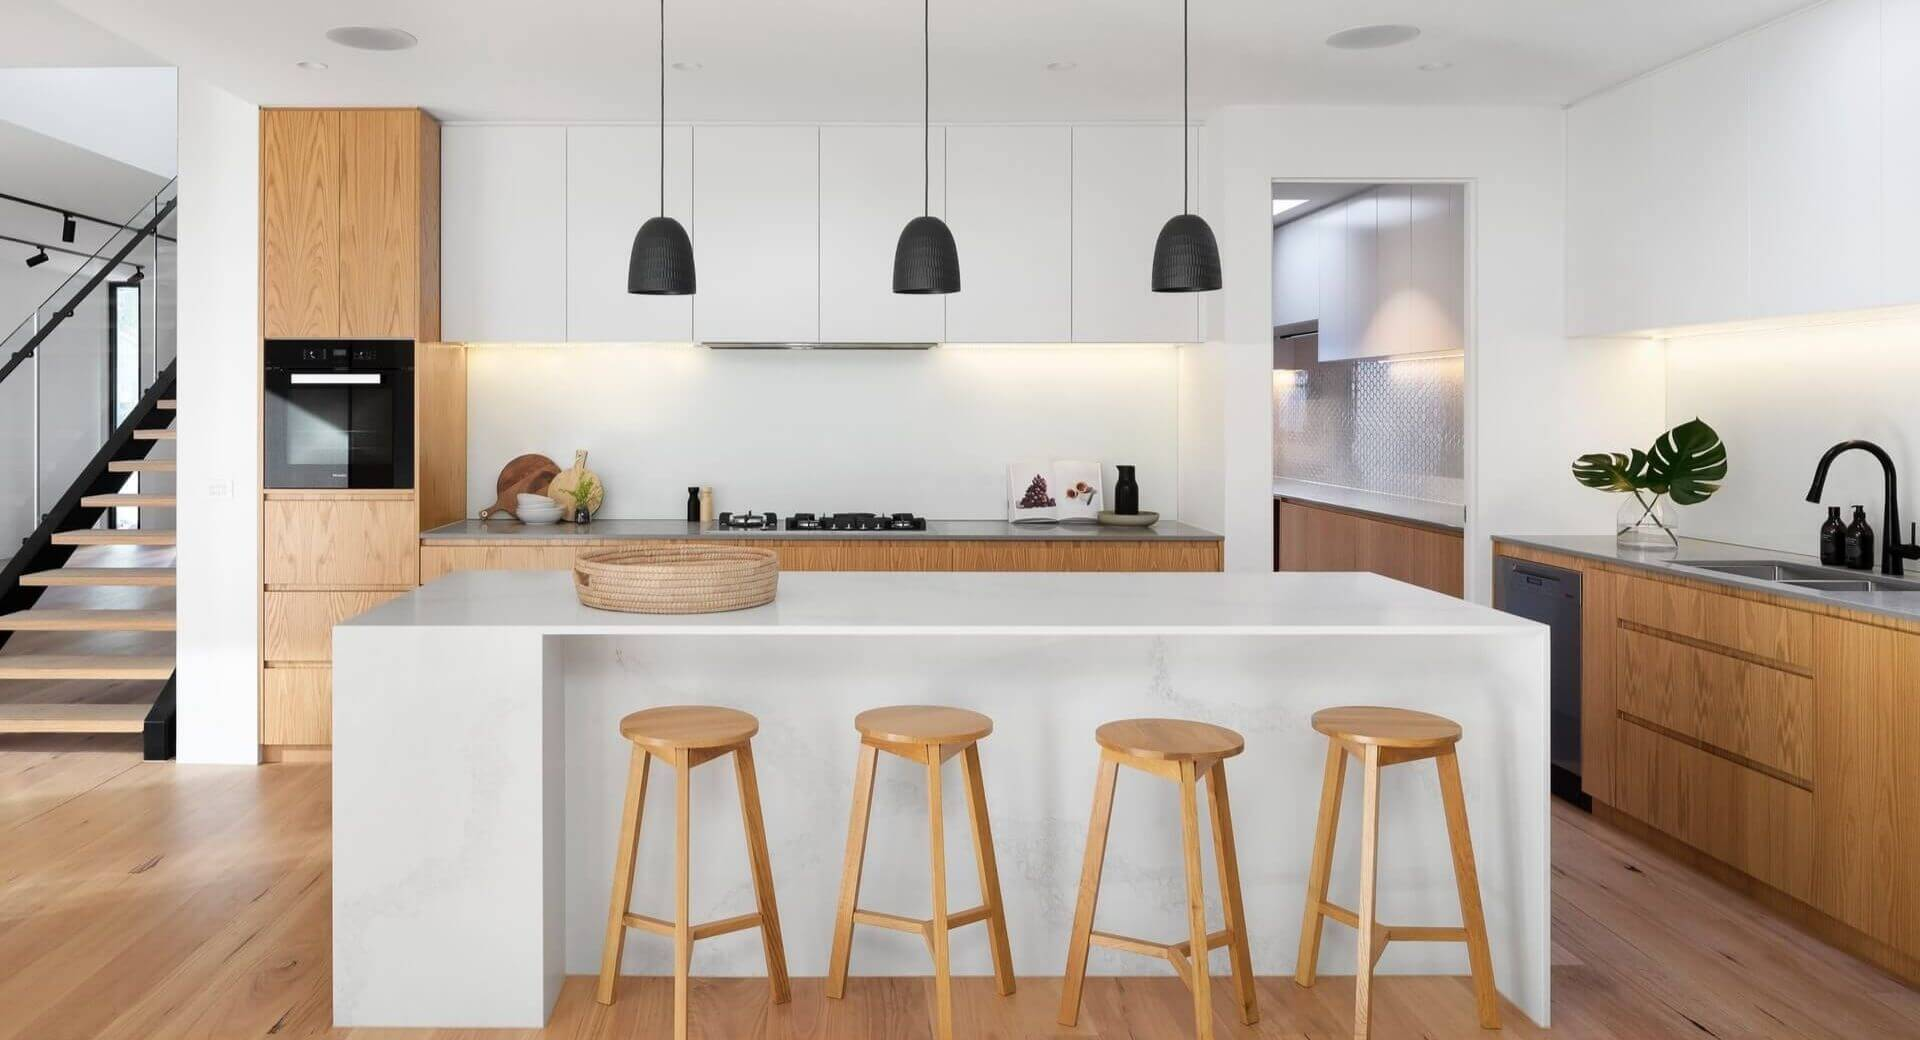 Kitchendesign Látványterv Konyhabútor